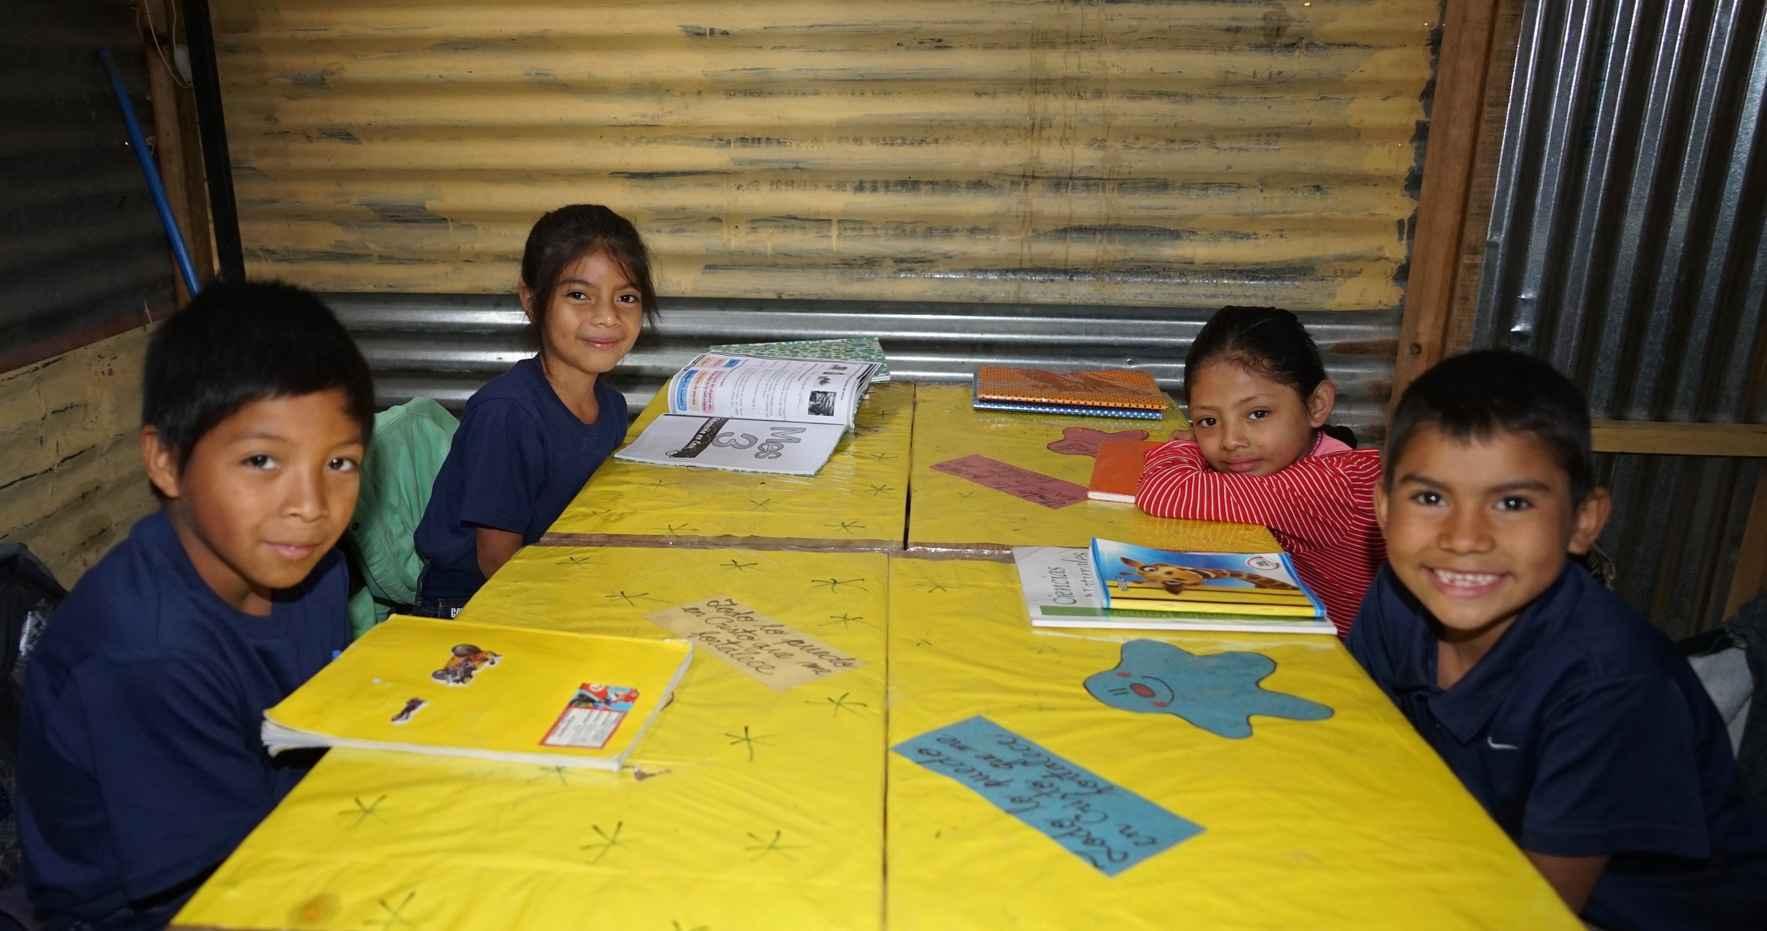 Sponsor a child's education image